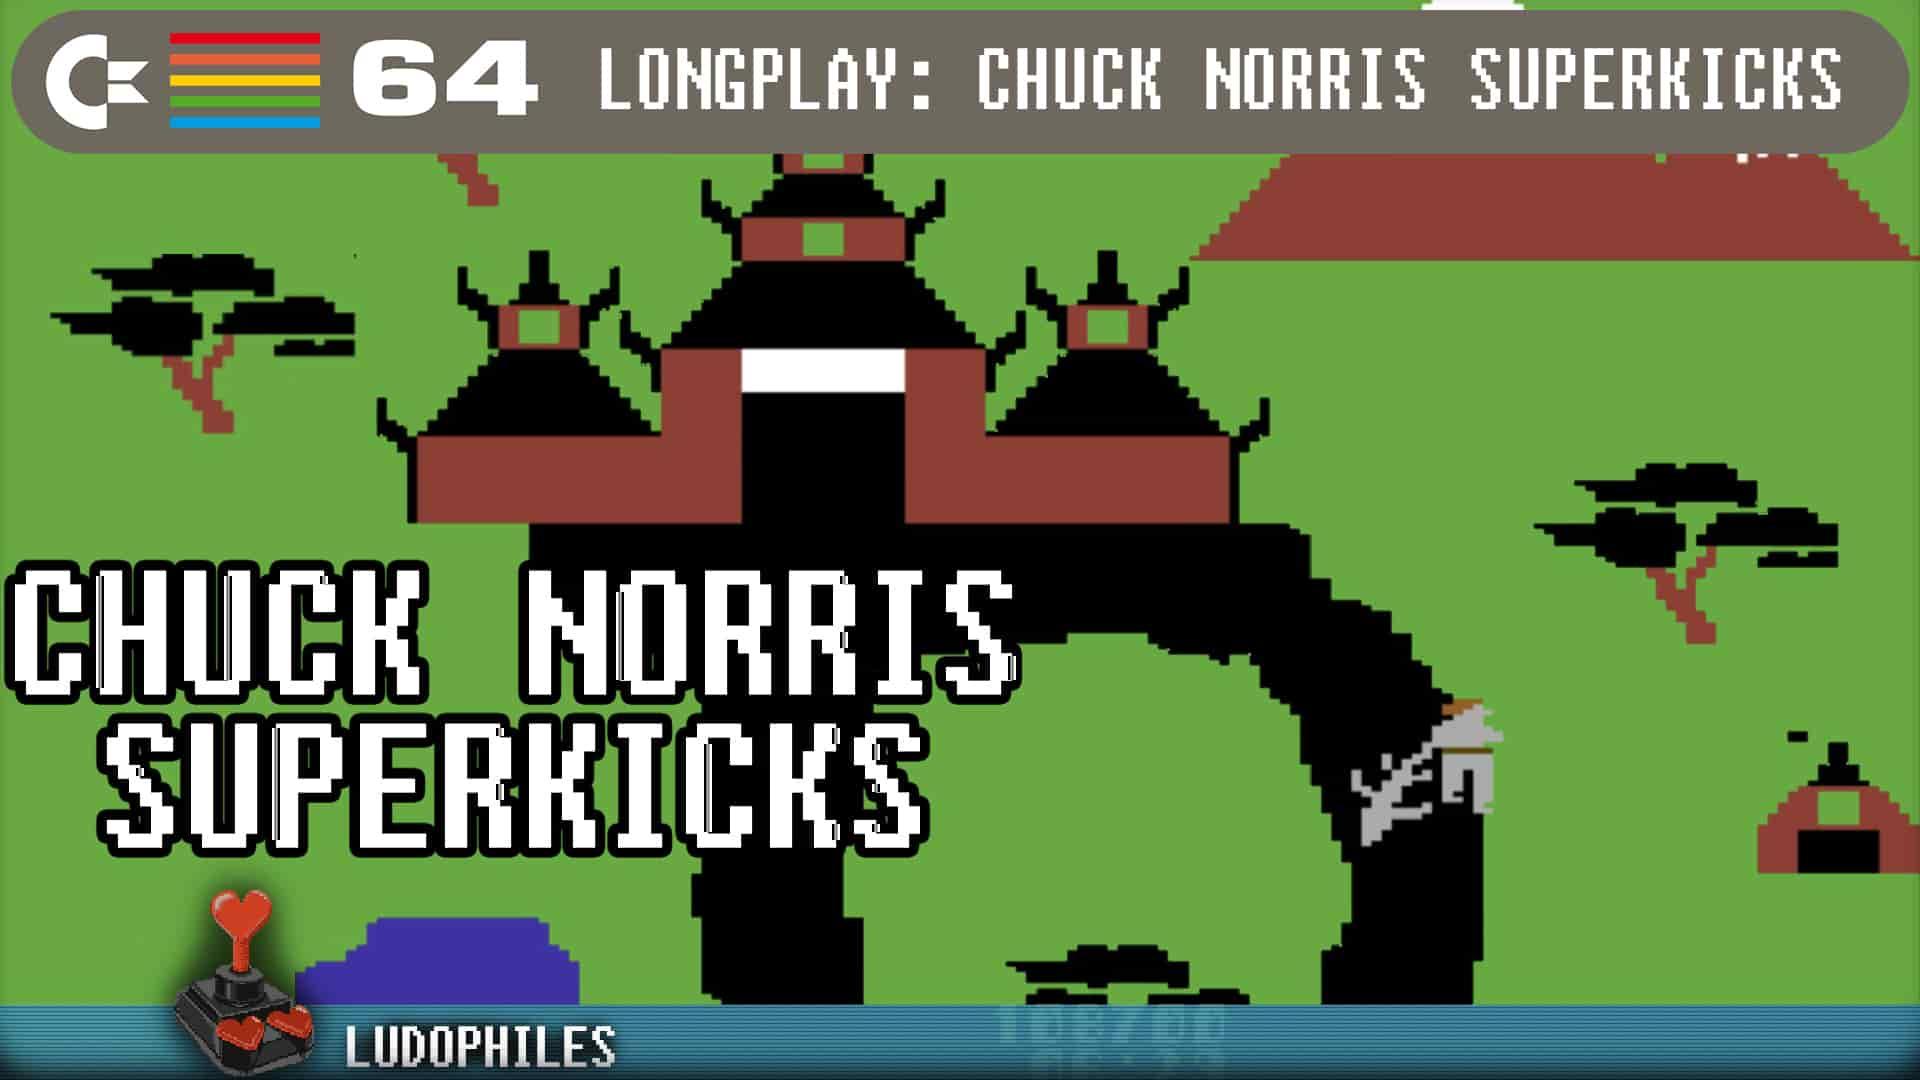 Chuck Norris Superkicks C64 Longplay